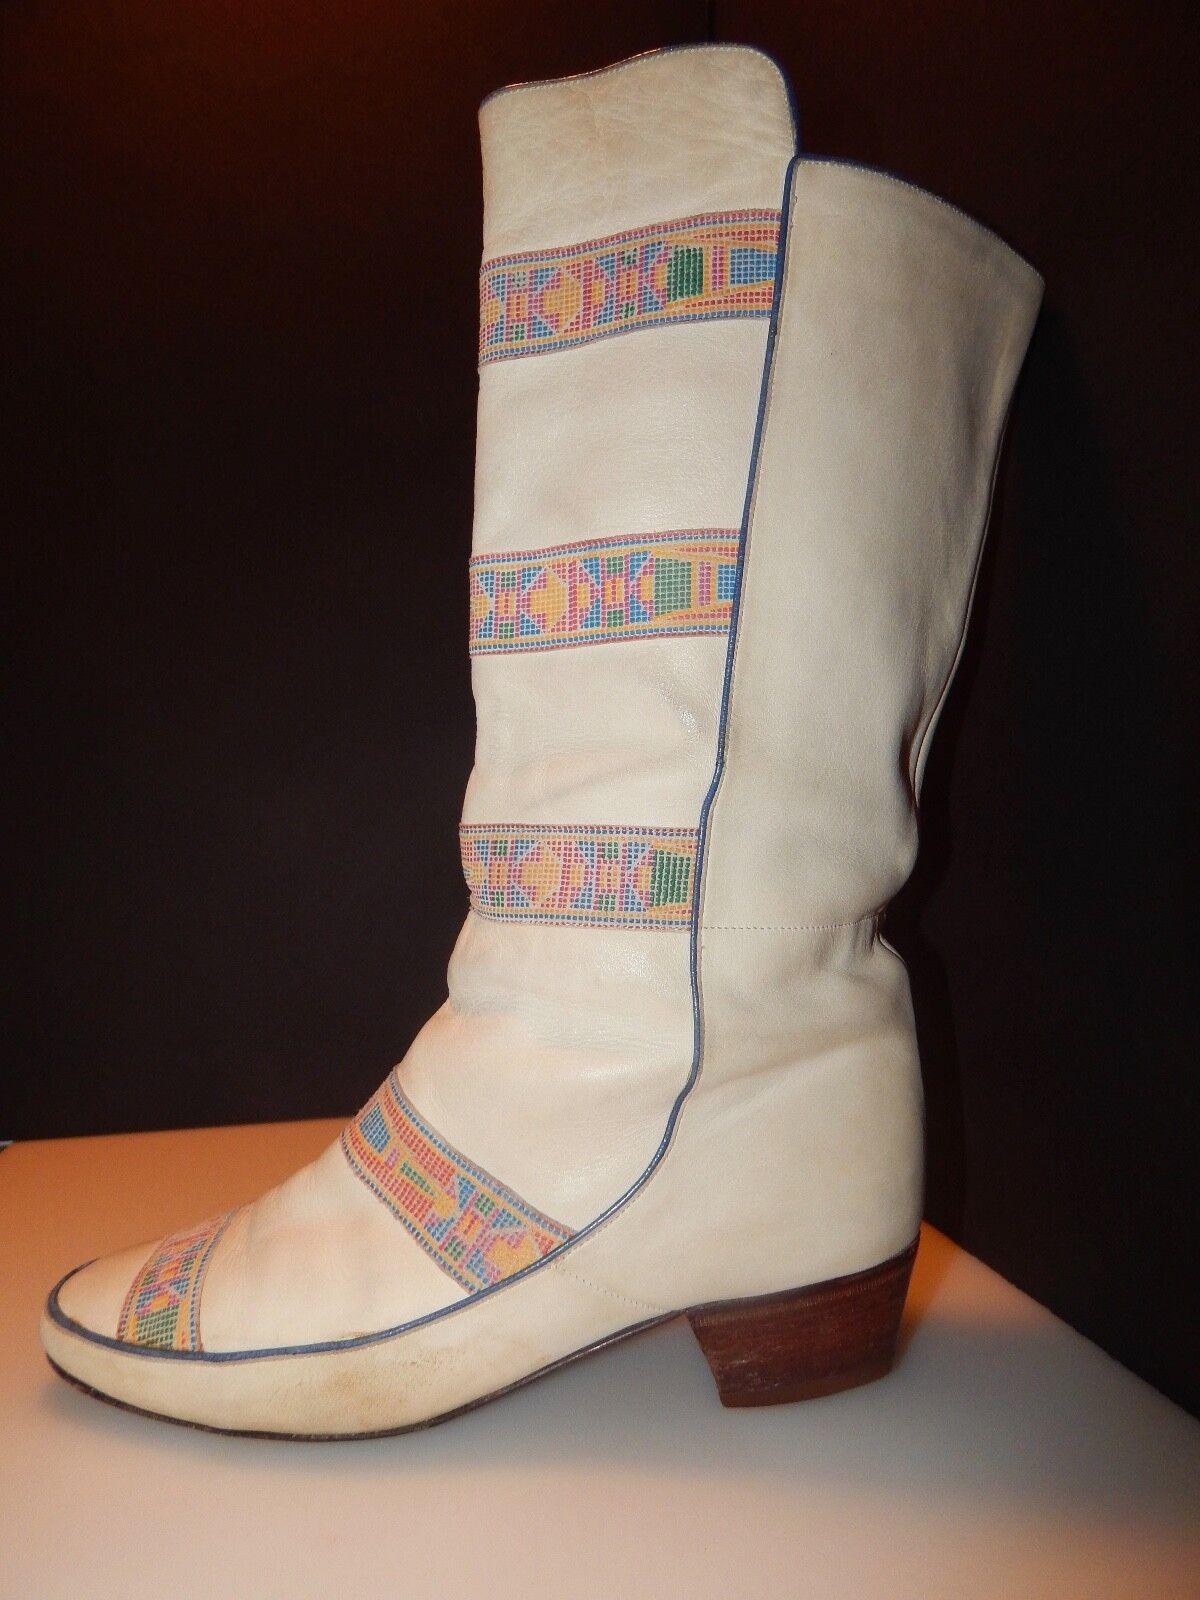 Pollini Leather Boots   US Size 6.5, bluee Trim, Boho, , Free Ship